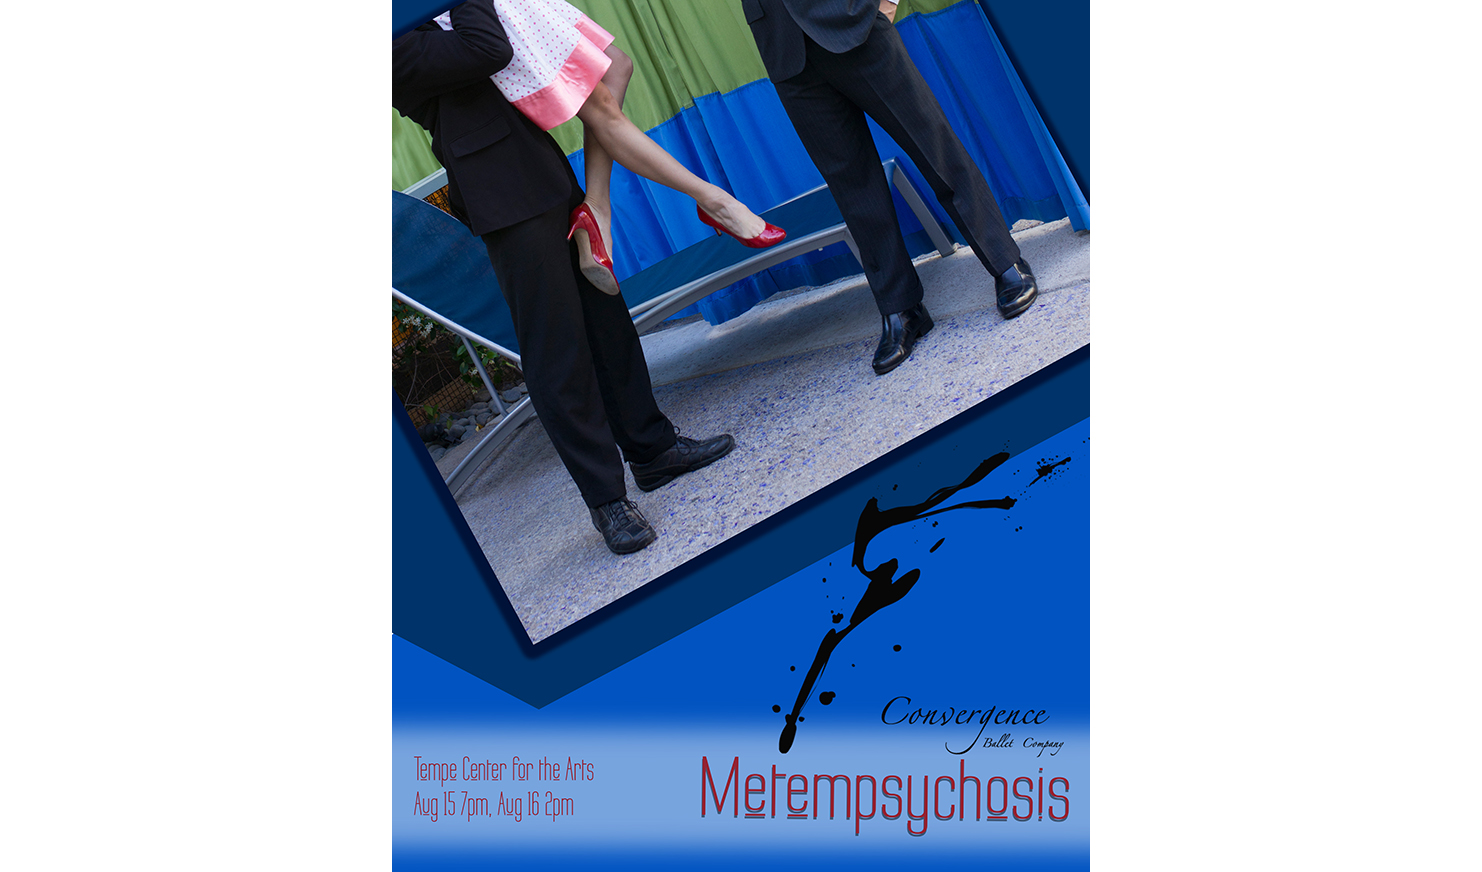 MetempsychosisFlyer